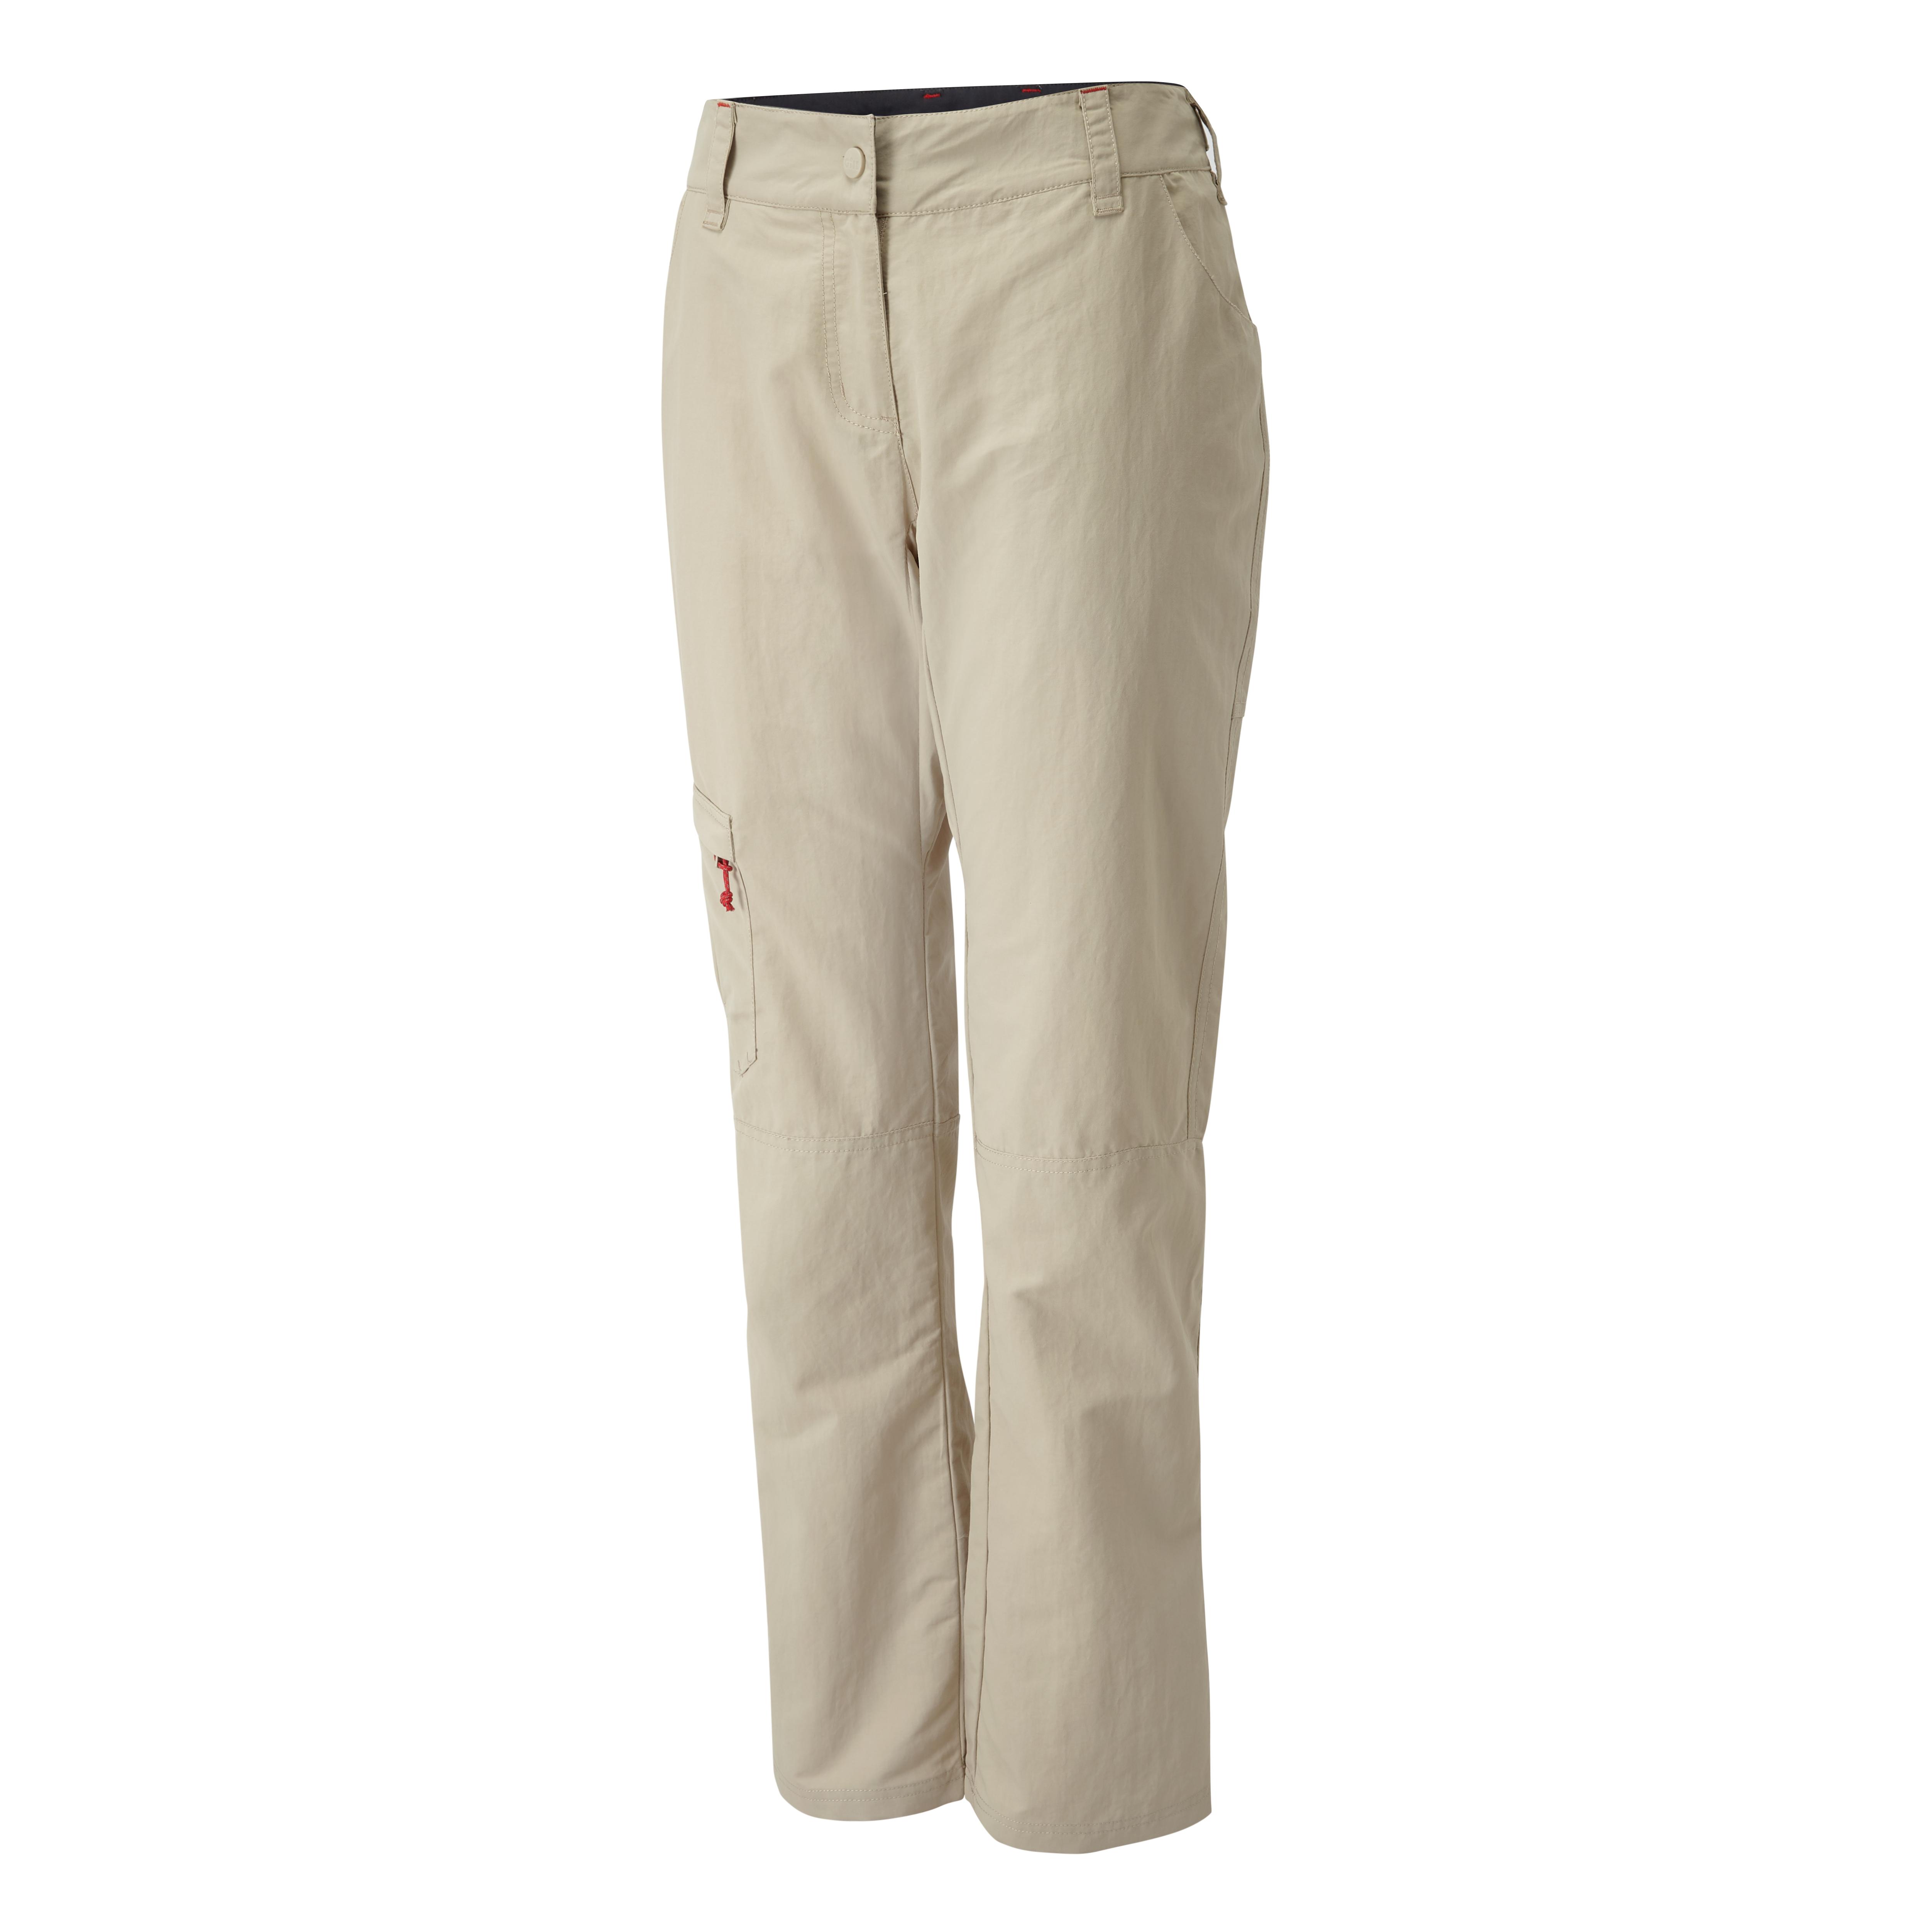 Women's UV Tec Trousers - UV014W-KHA01-2.jpg